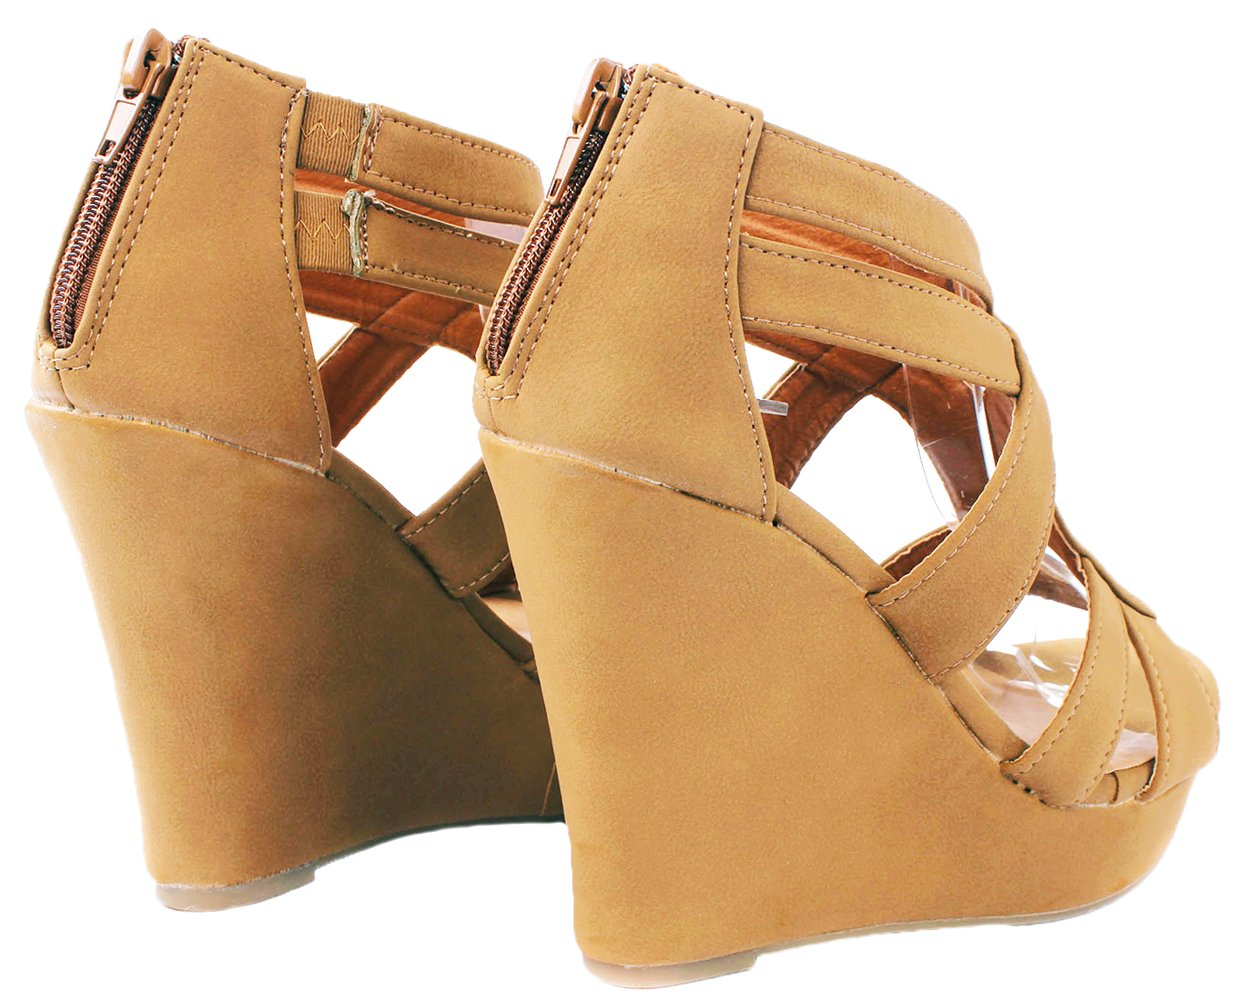 Women Lindy Comfort Gladiator Strappy Faux Leather/Nubuck Dress Platform High B(M) Wedge Sandals B071PF52NN 8.5 B(M) High US|Tan_l3 266d94